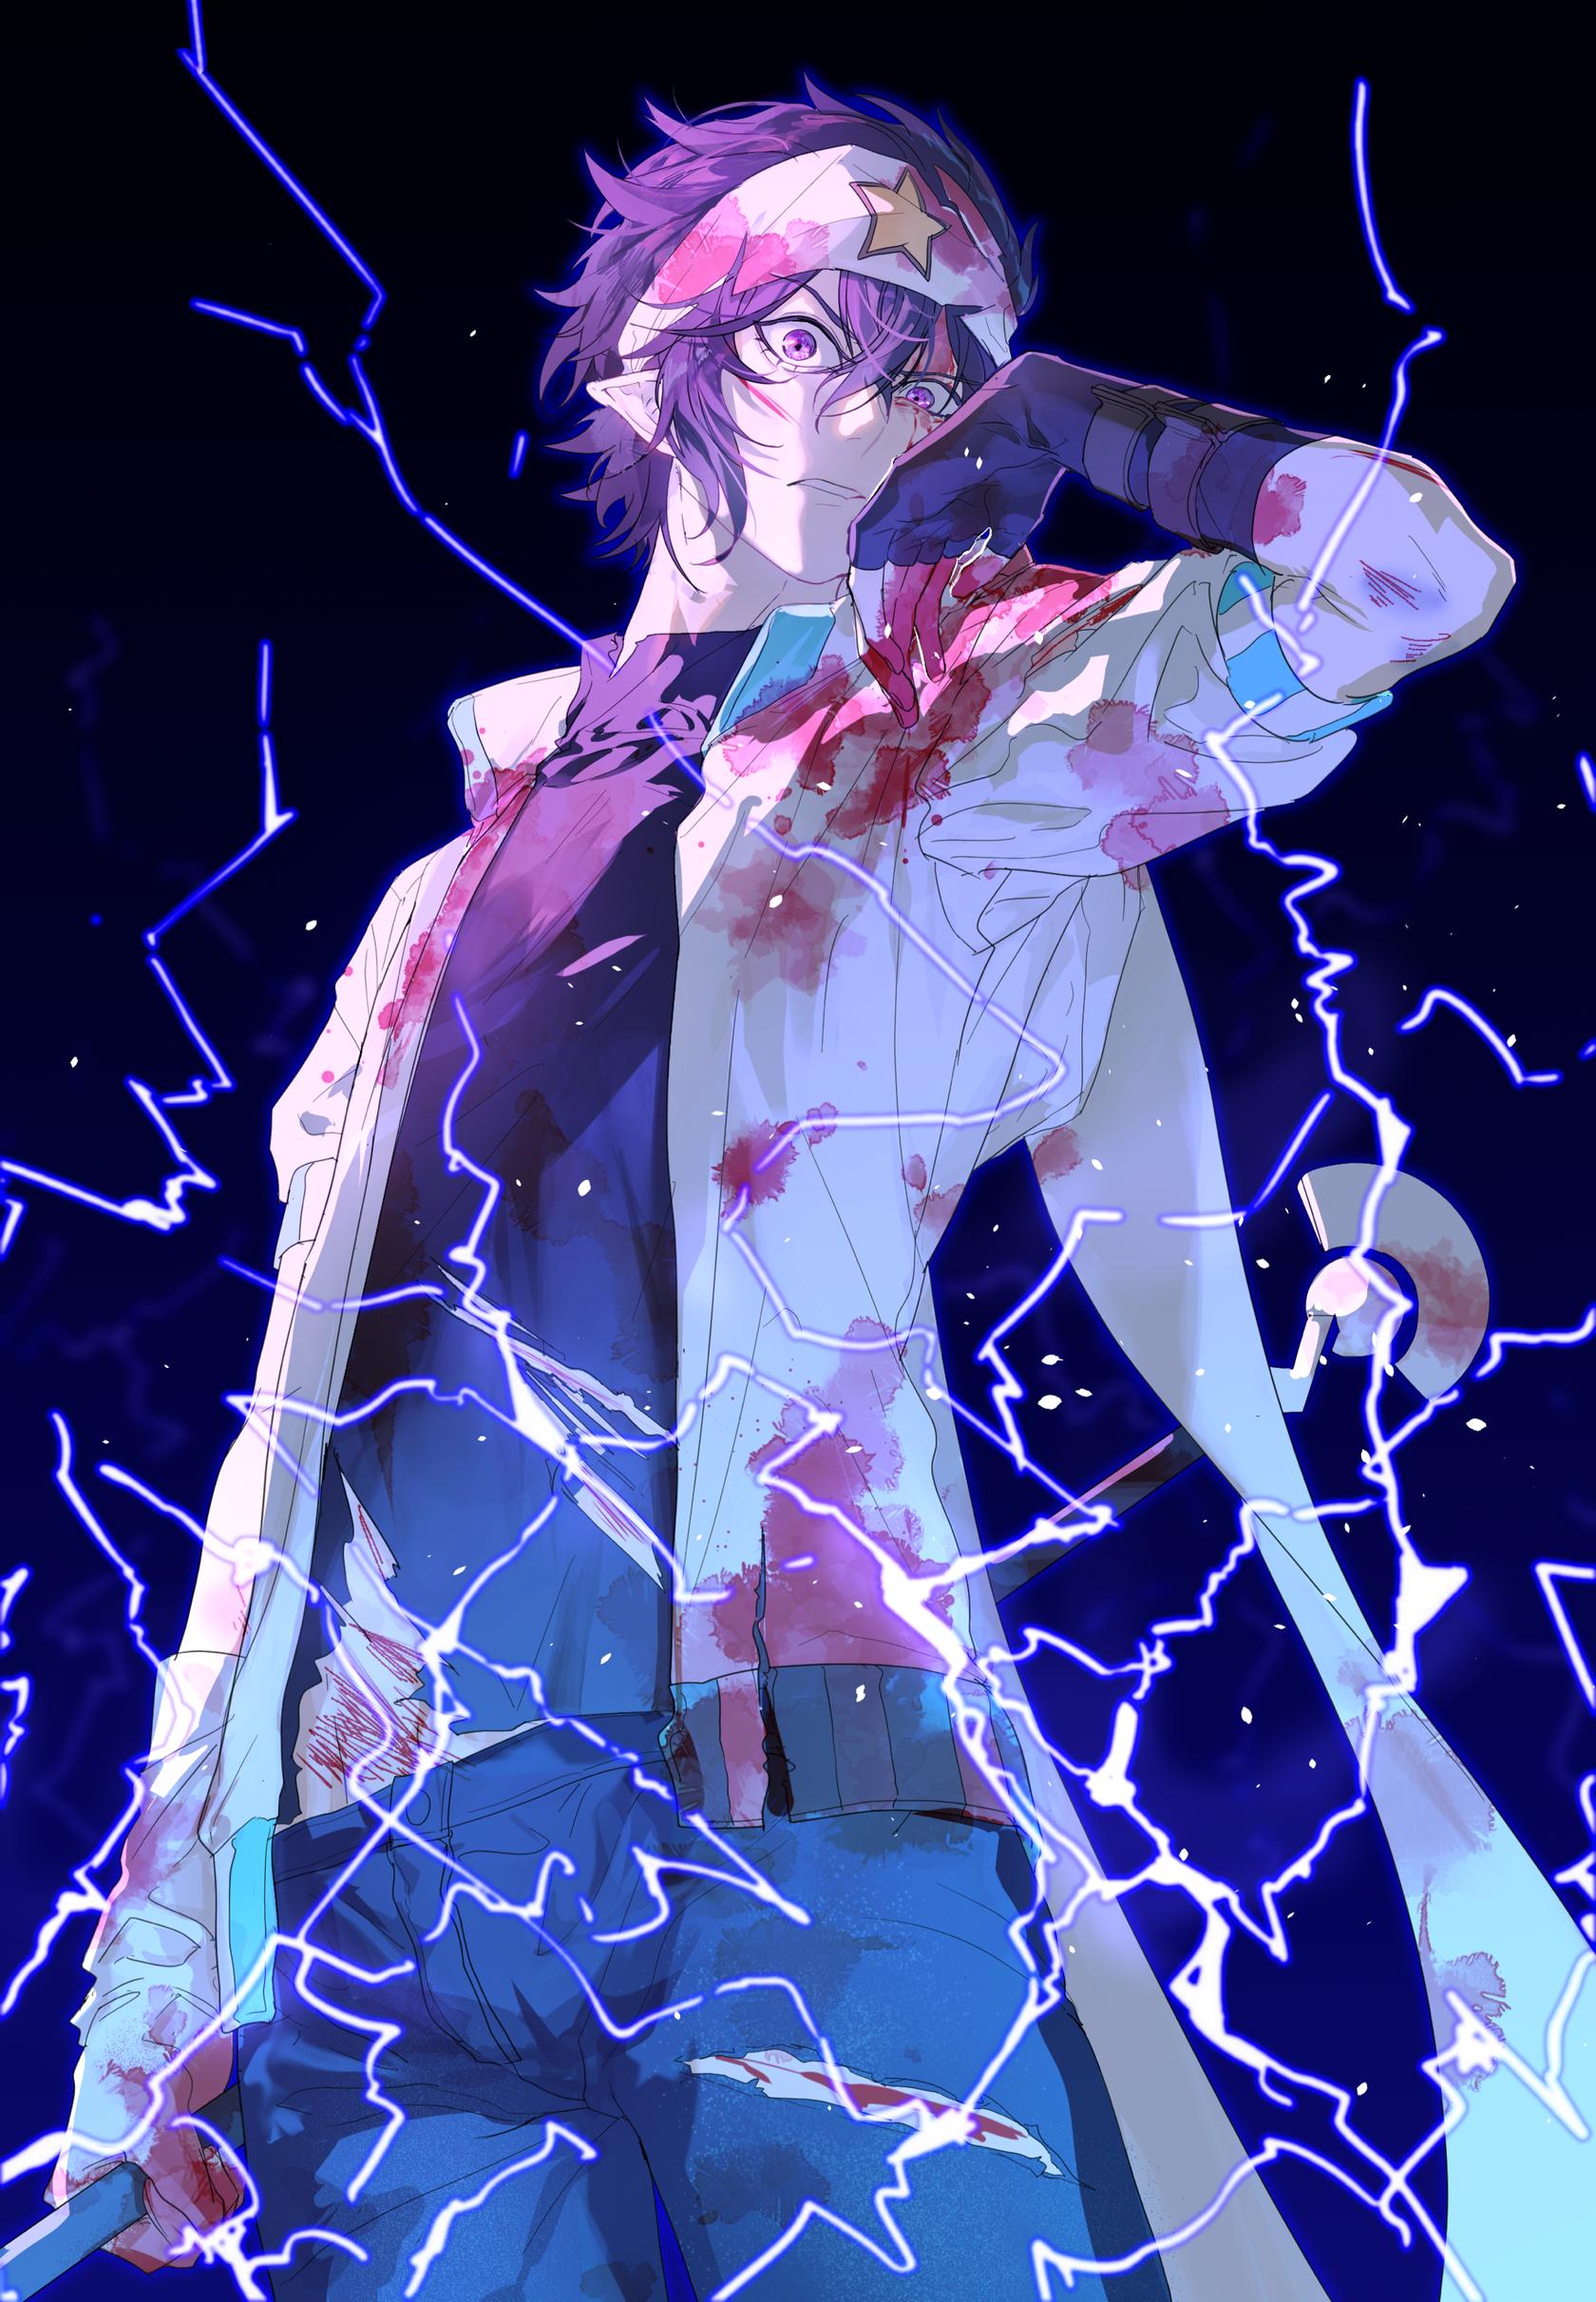 Pin by 琪 林 on 凹凸世界 My hero academia, Anime, World